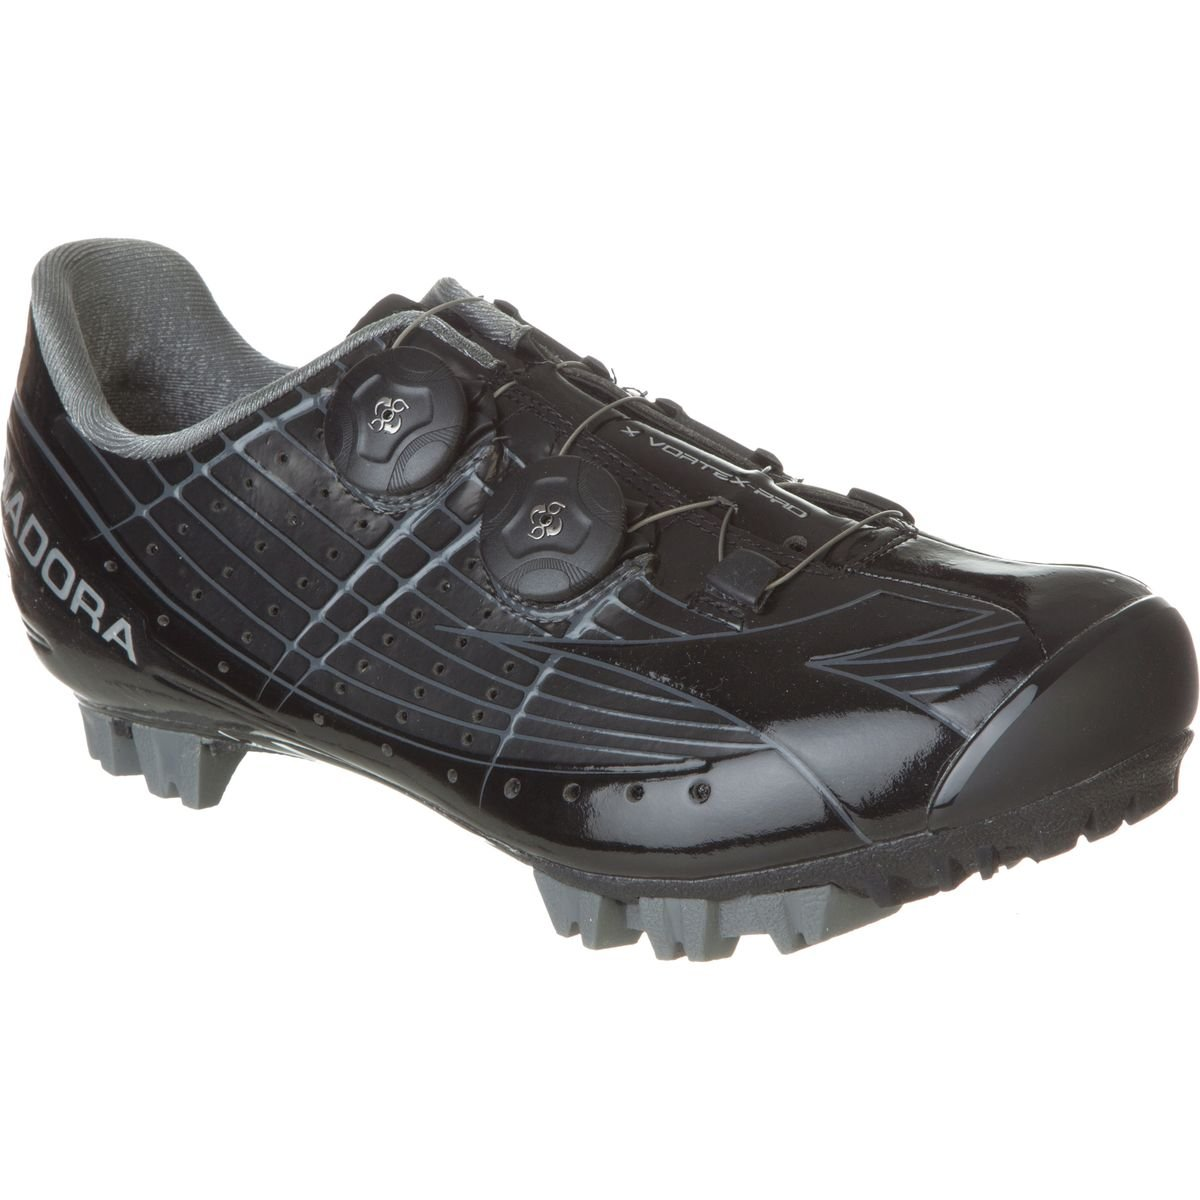 Diadora x-vortex Pro Shoes – Men 's 48 ブラック/ブラック B00TXMM9SW